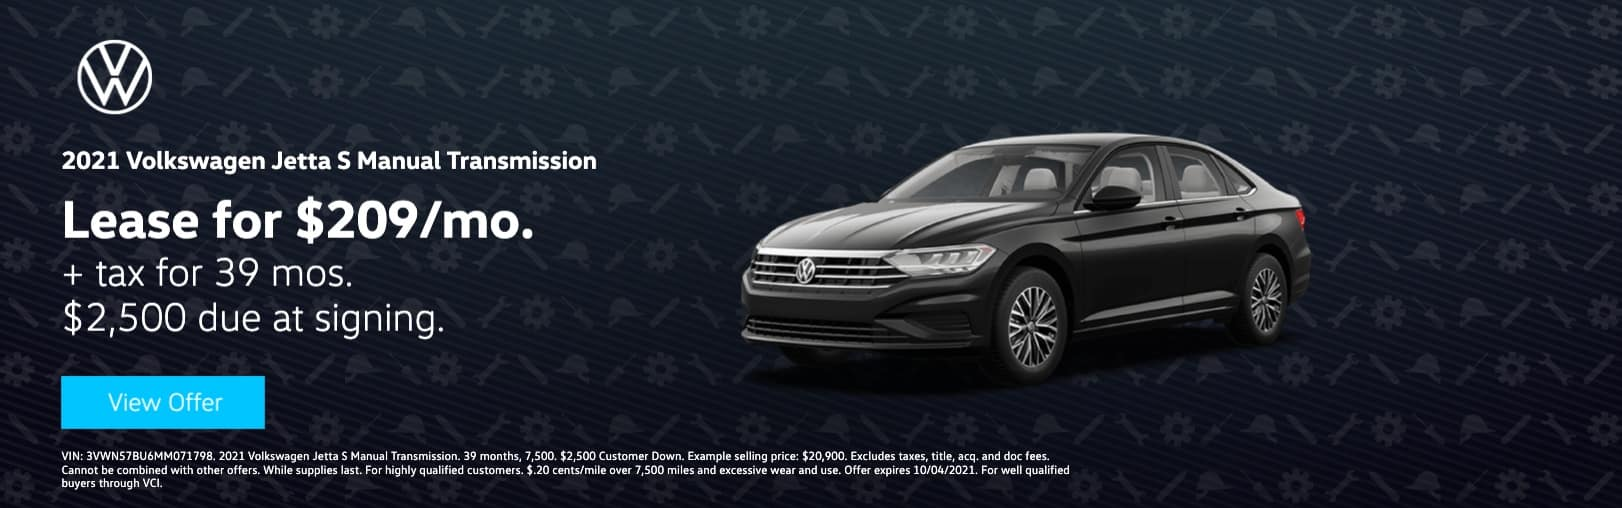 Volkswagen South Coast_test_website_3vwn57bu6mm071798_1622 x 508_2021_volkswagen_jetta_s manual transmission__3